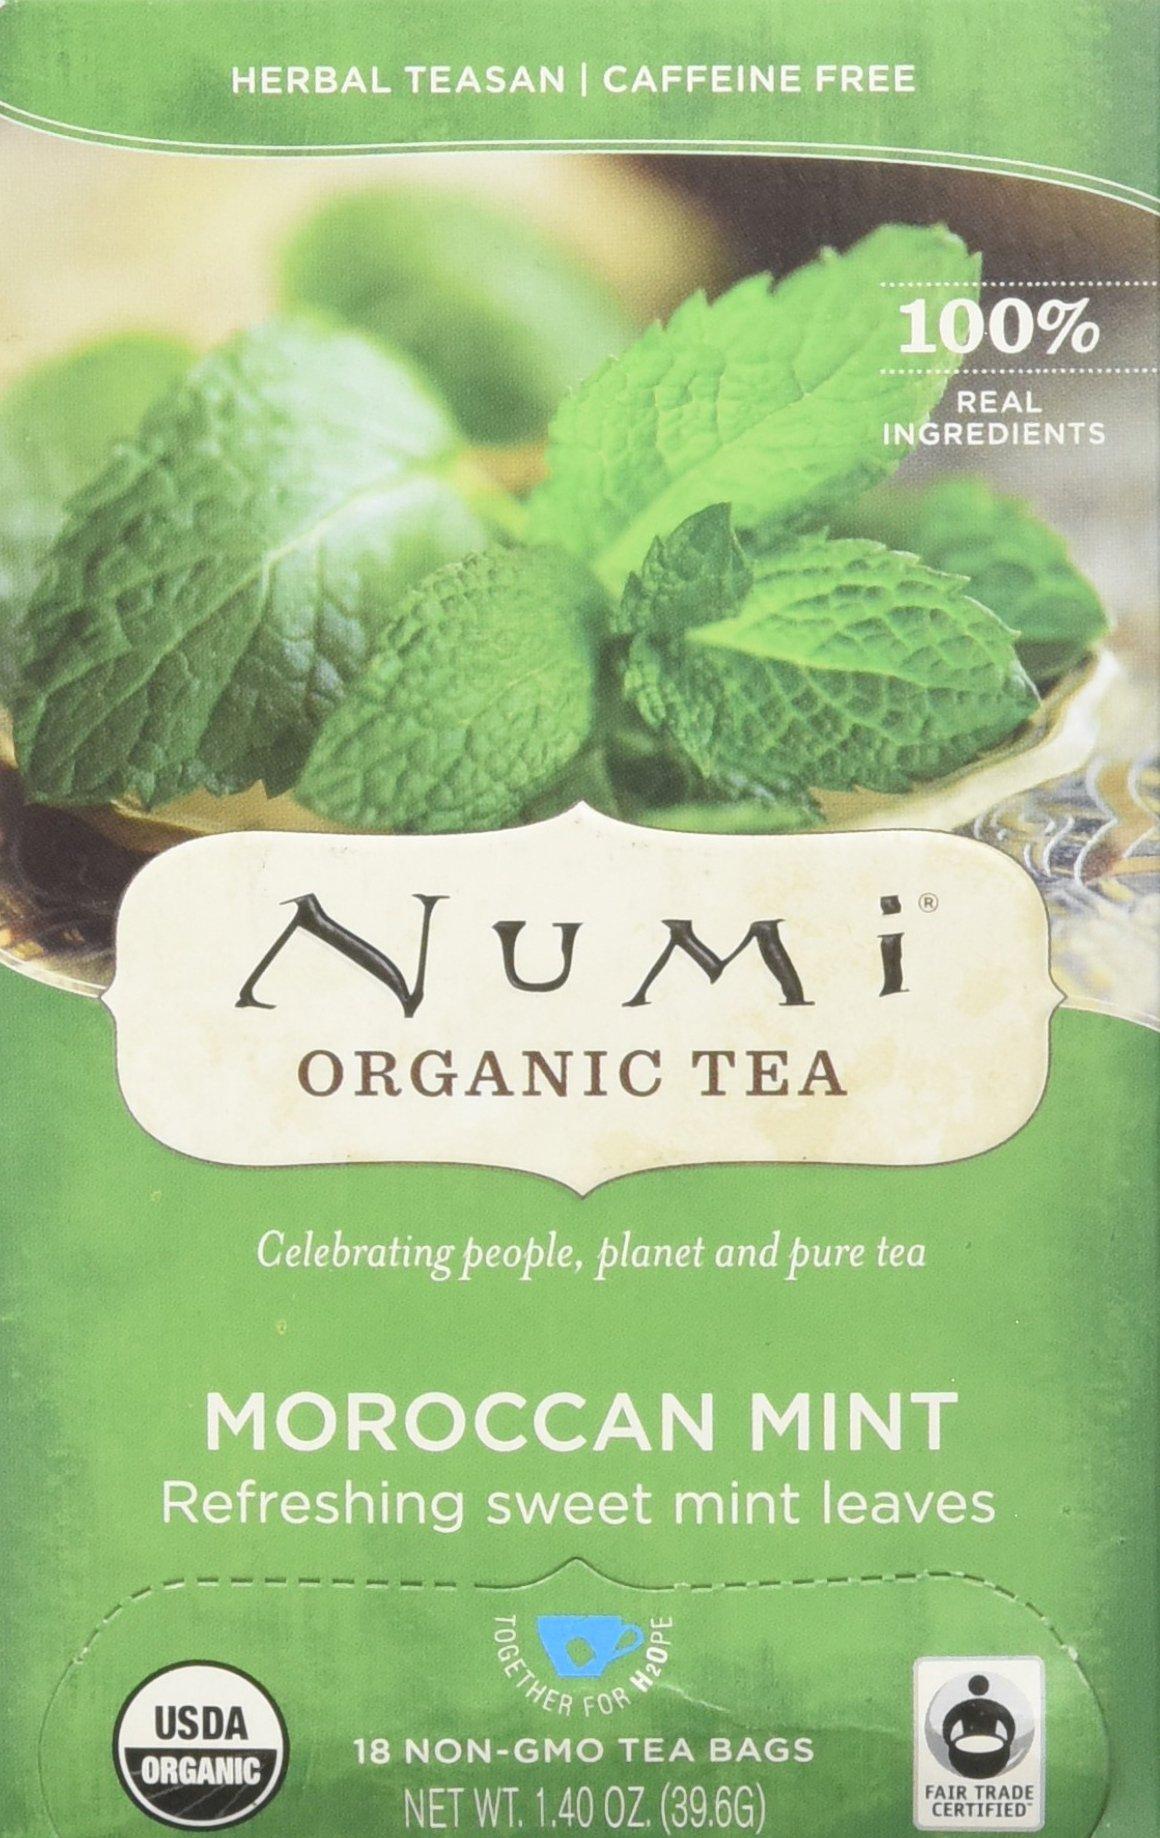 Numi Teas Organic Teas and Teasans, Moroccan Mint